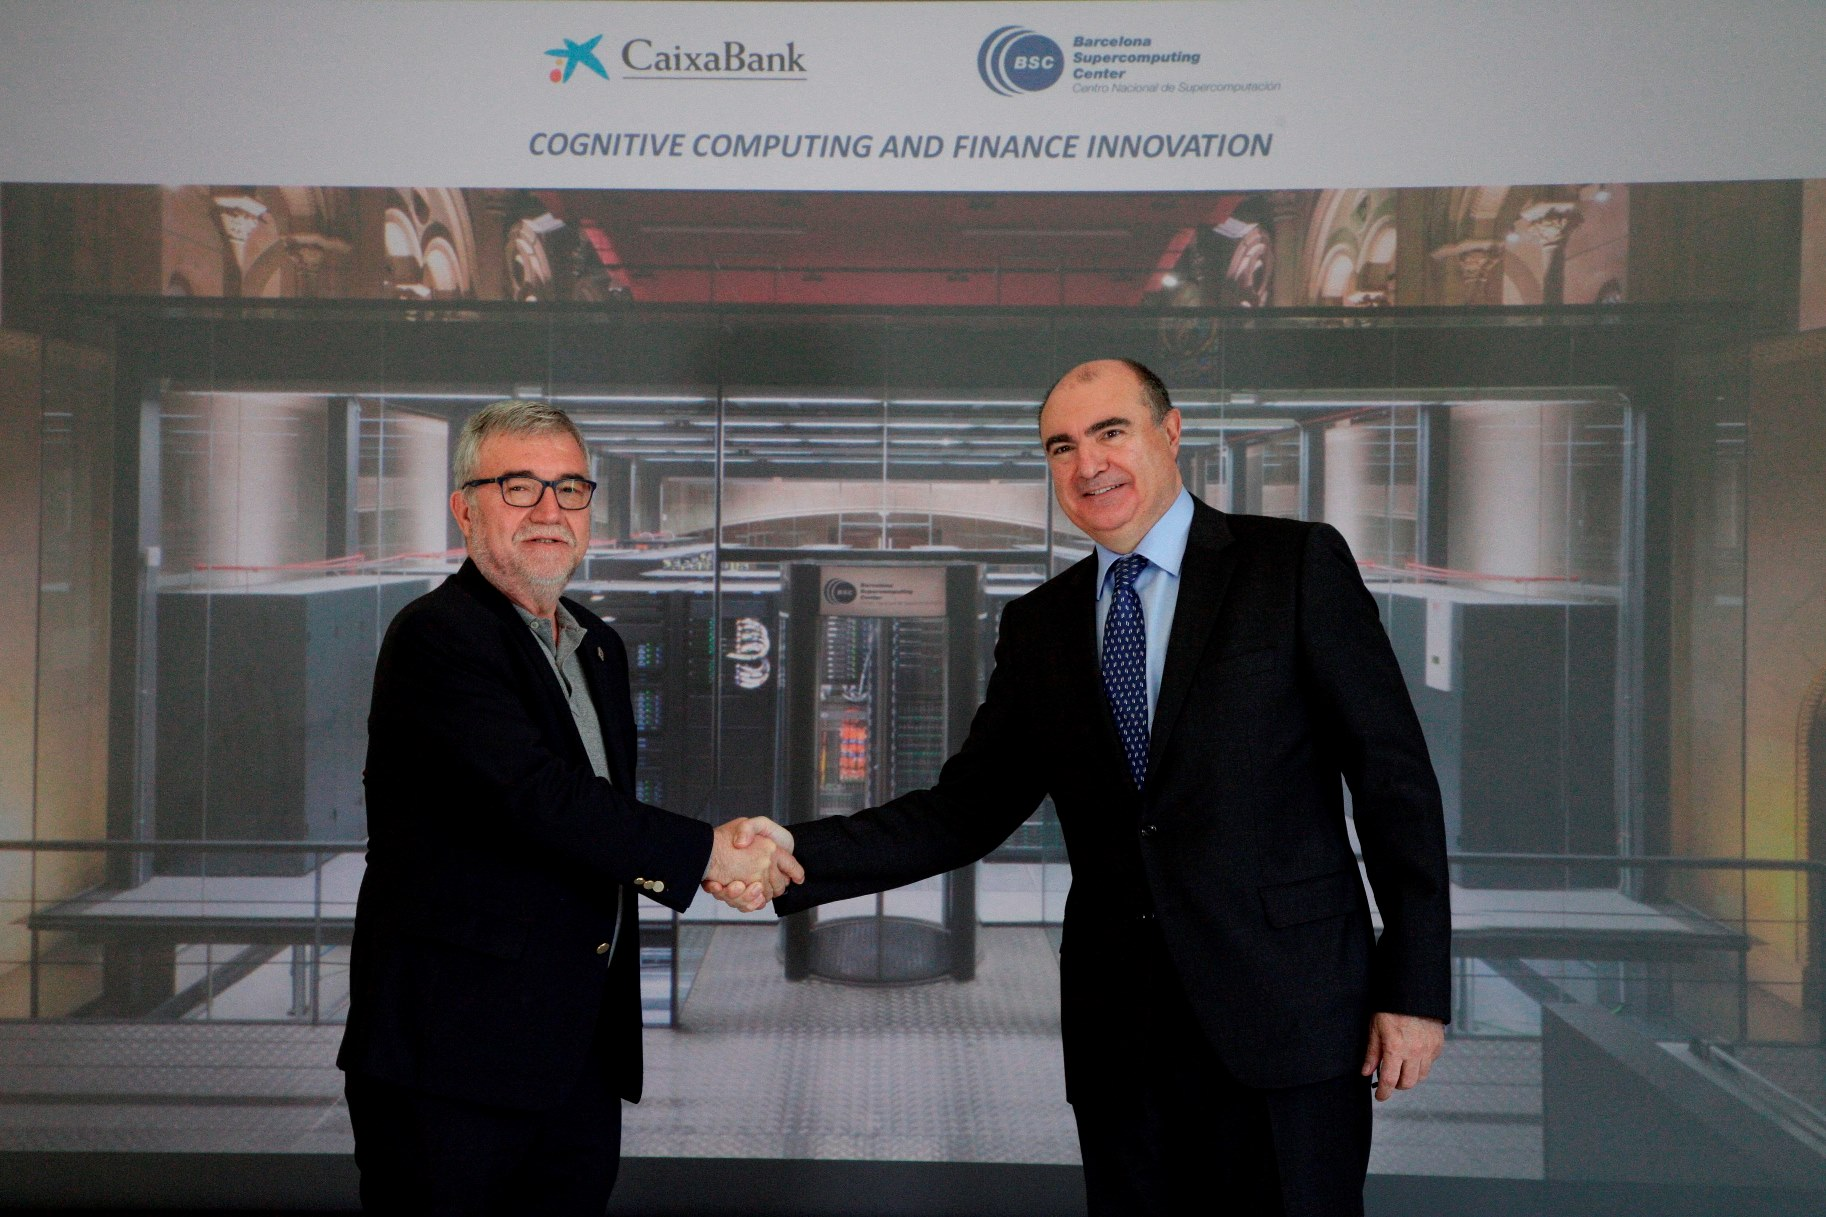 De izquierda a derecha, Mateo Valero, director del BSC, y Jordi Fontanals, director ejecutivo de CaixaBank (1)